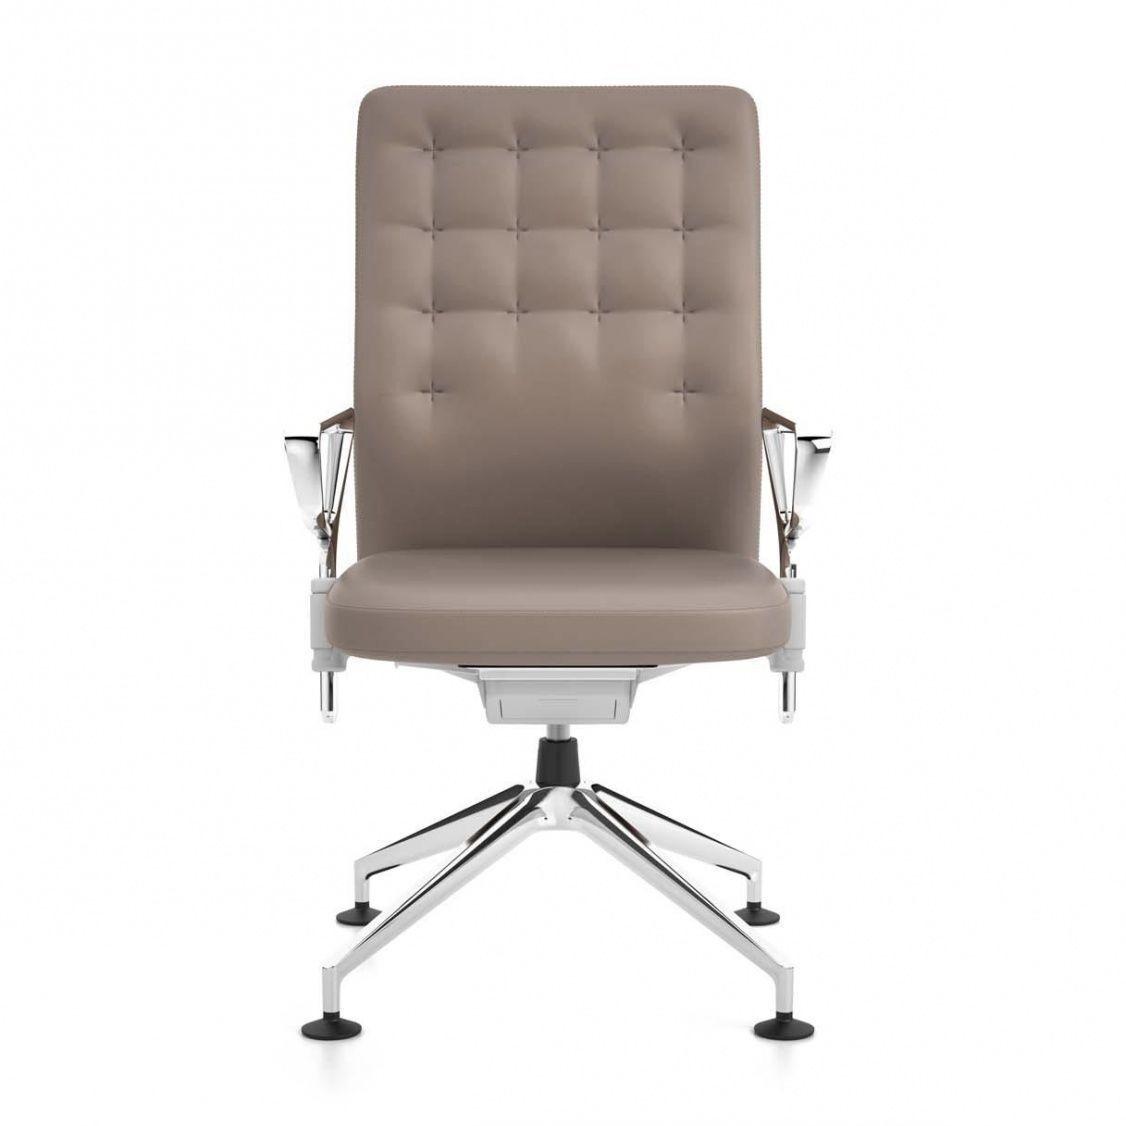 id trim citterio bureaustoel conferentiestoel vitra. Black Bedroom Furniture Sets. Home Design Ideas